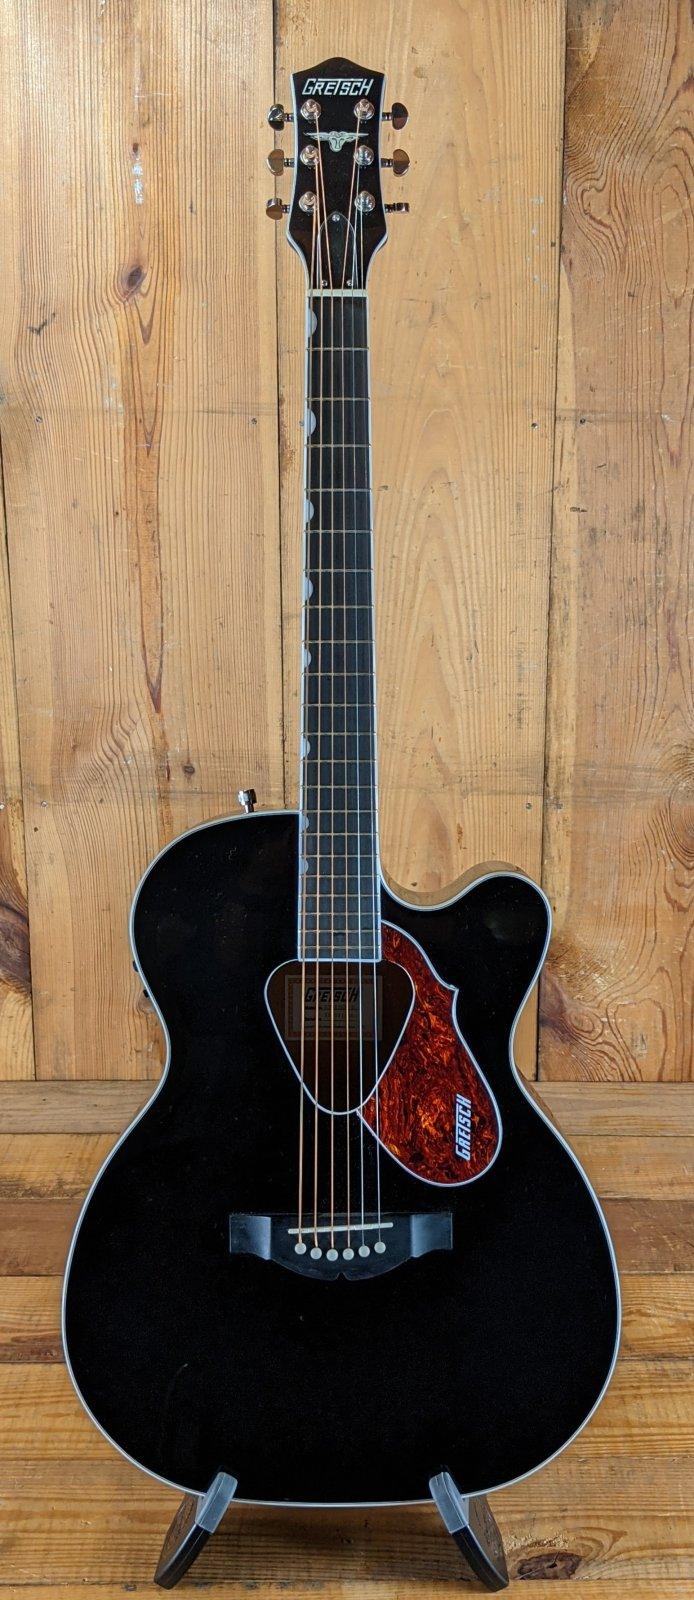 Gretsch G5013CE Rancher Jr. Cutaway Acoustic Electric w/Fishman pickup